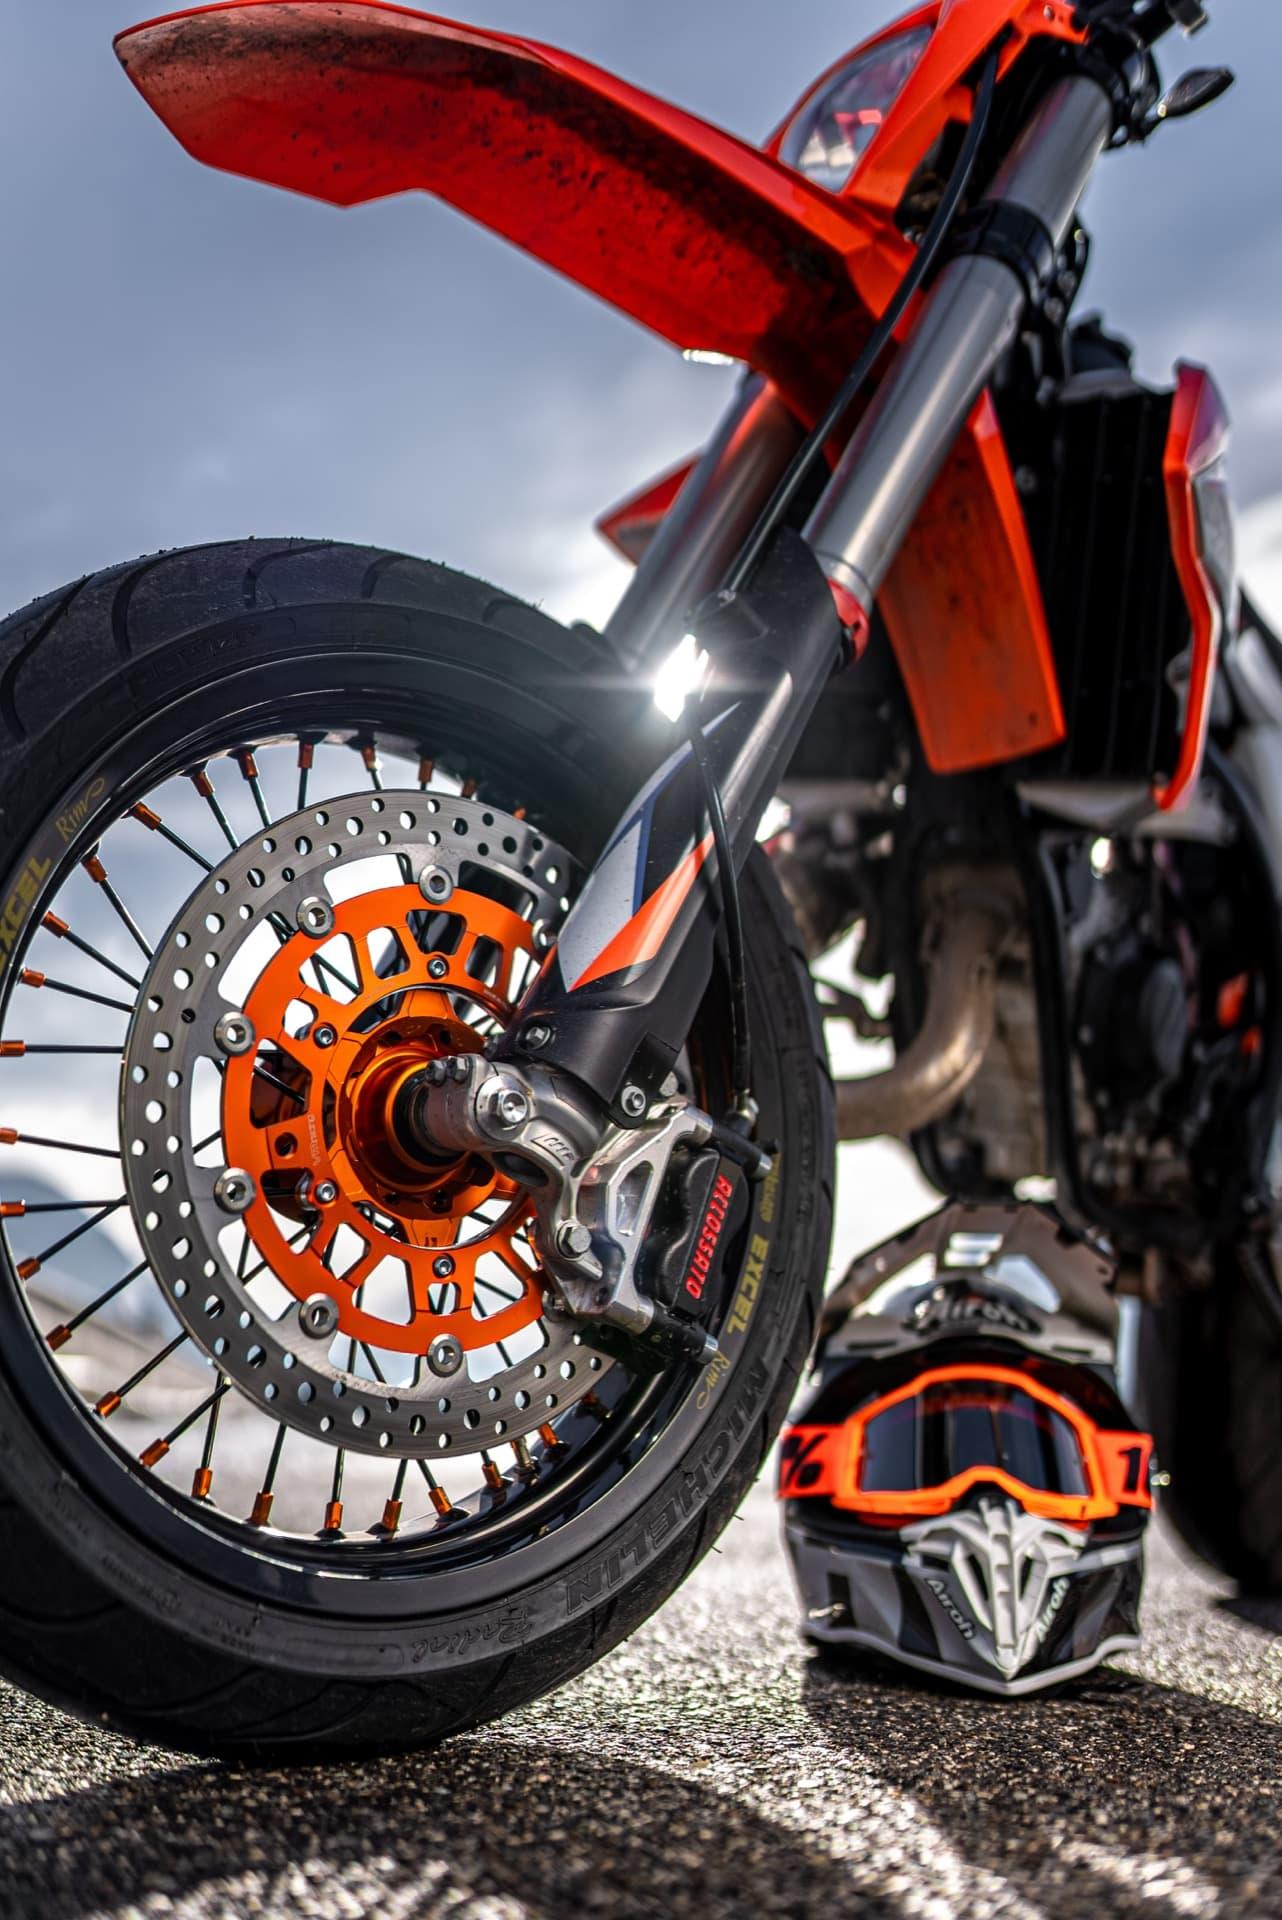 ¿Estudias o Trabajas?: Italika FT125 Sport - Motos